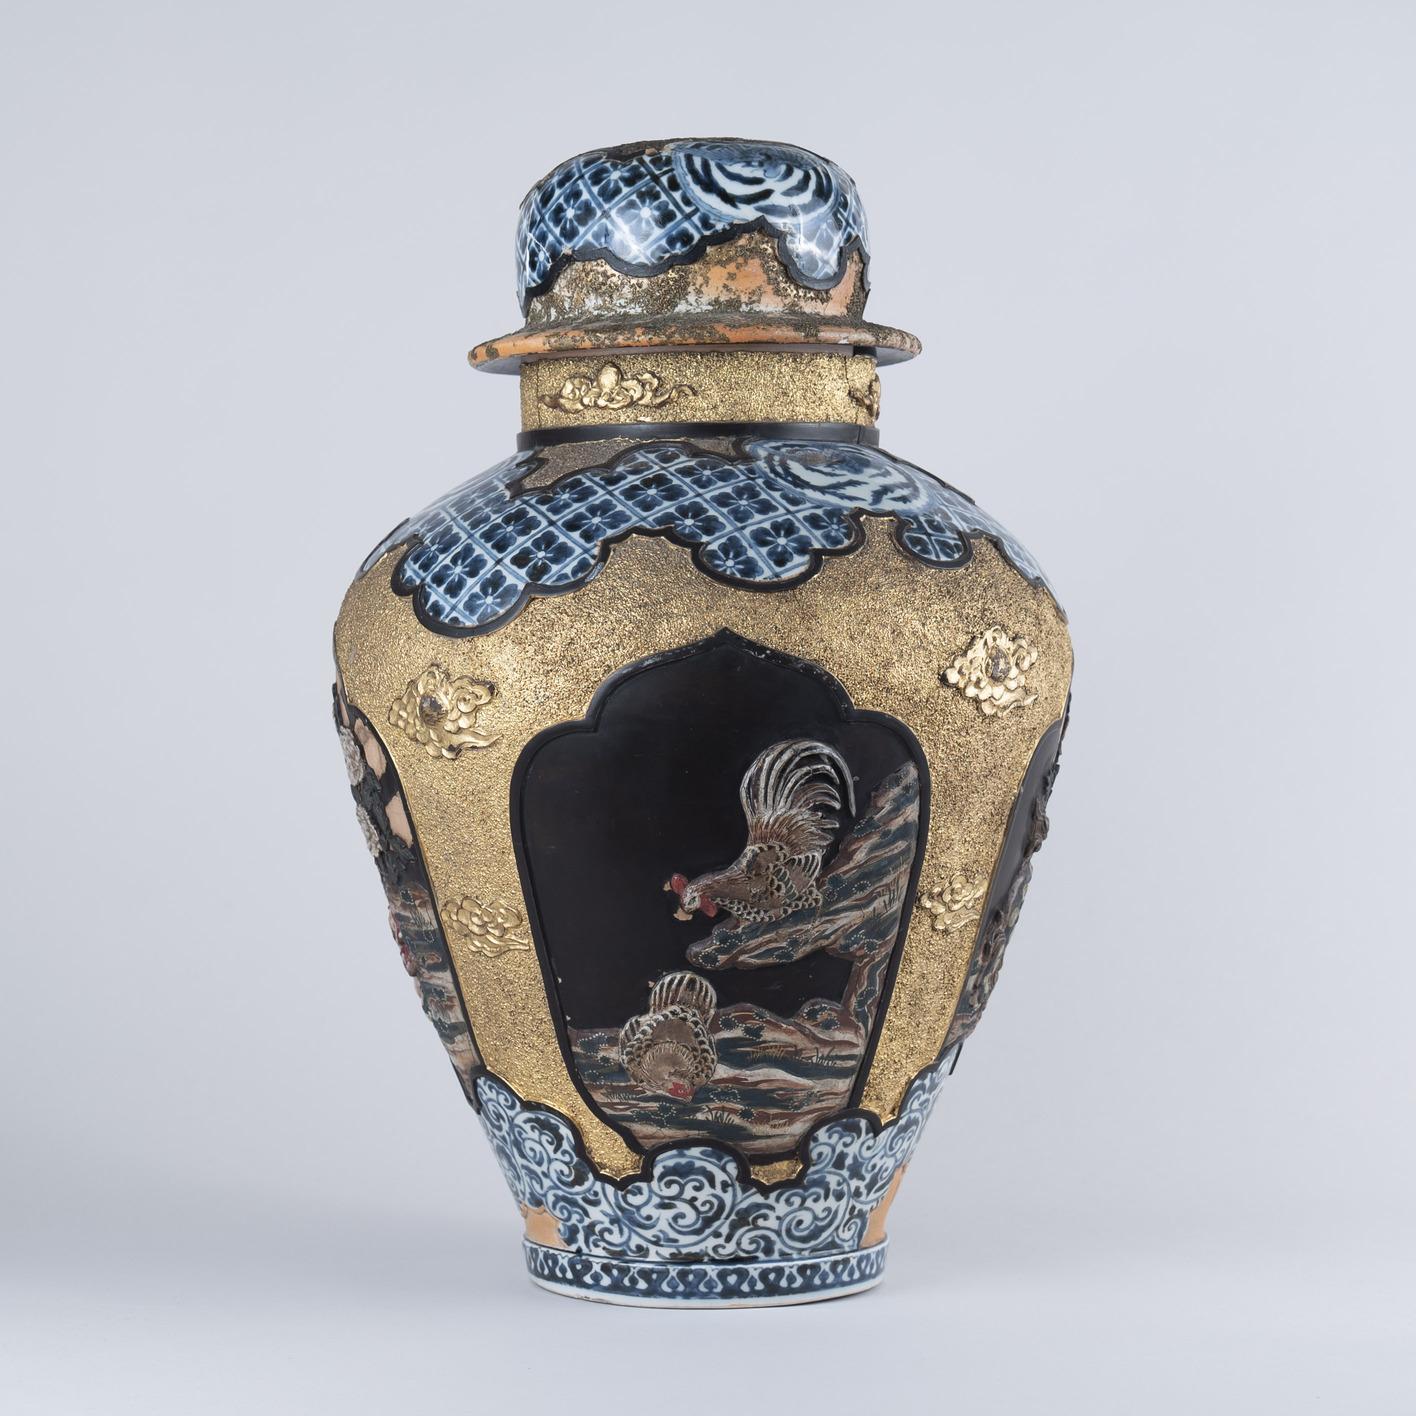 Very Rare Japanese Imari Lacquered Vase, circa 1700